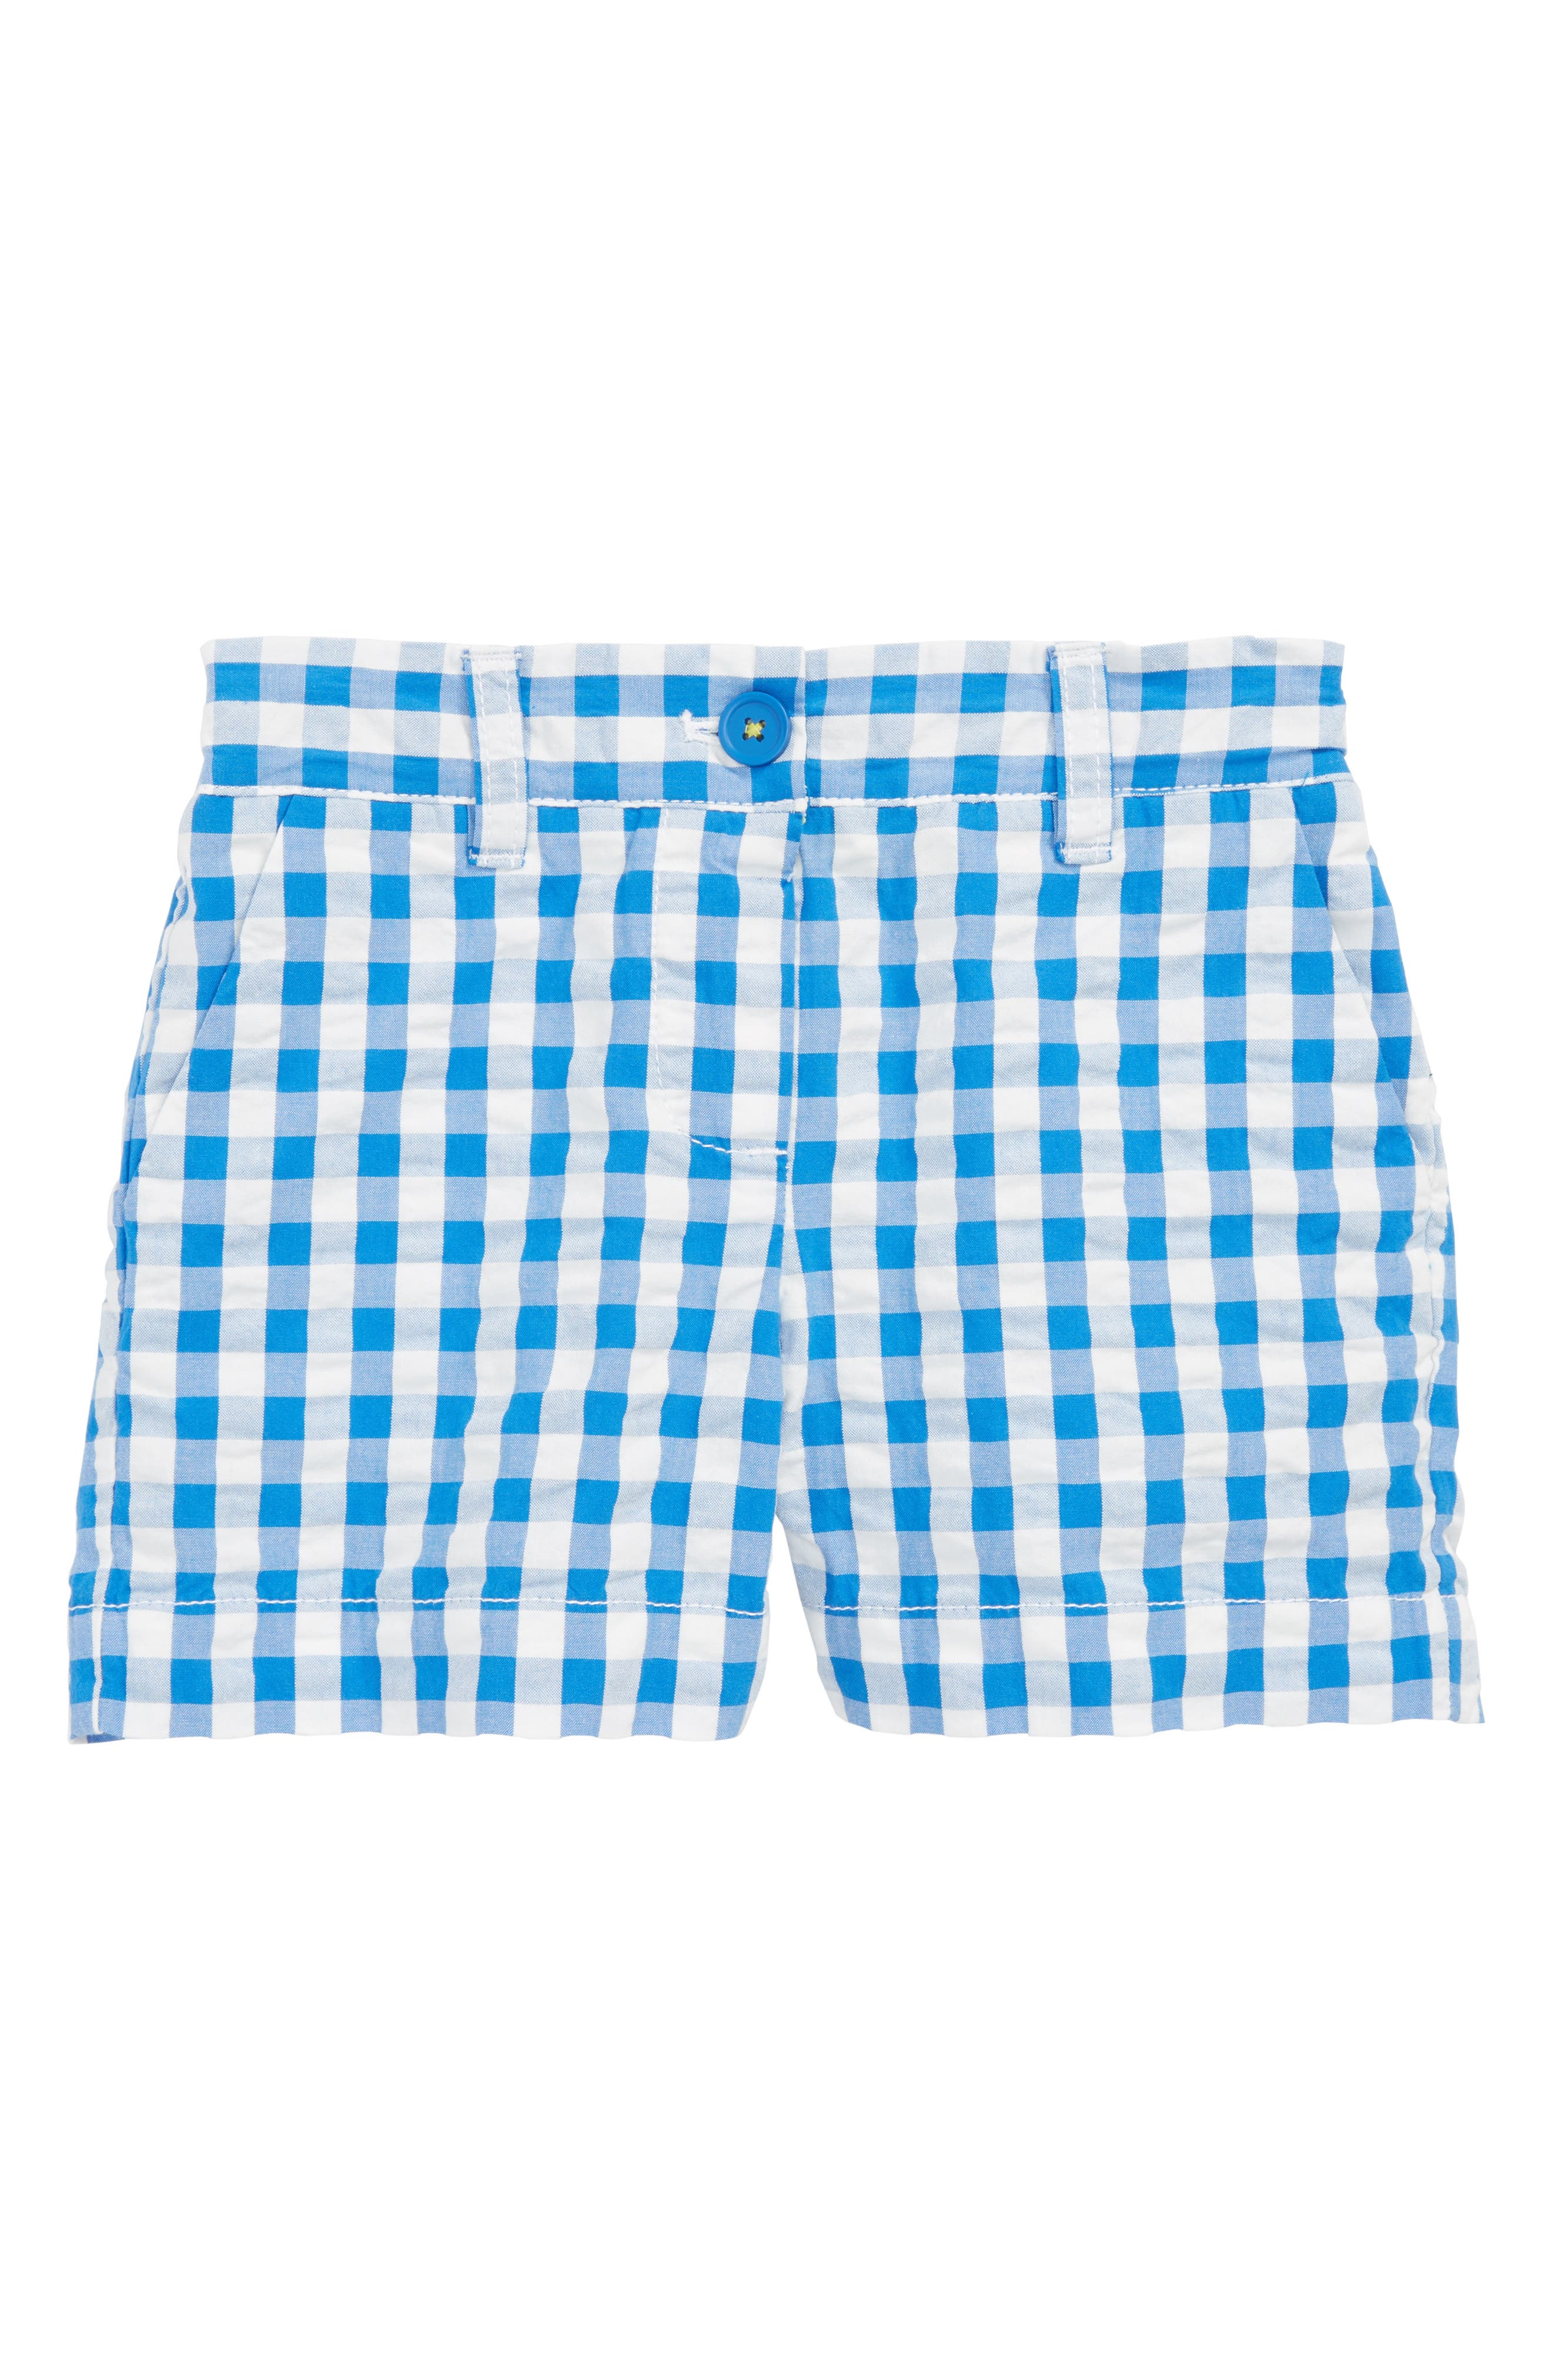 Bright Adventure Shorts,                             Main thumbnail 1, color,                             Skipper Blue Gingham Blu